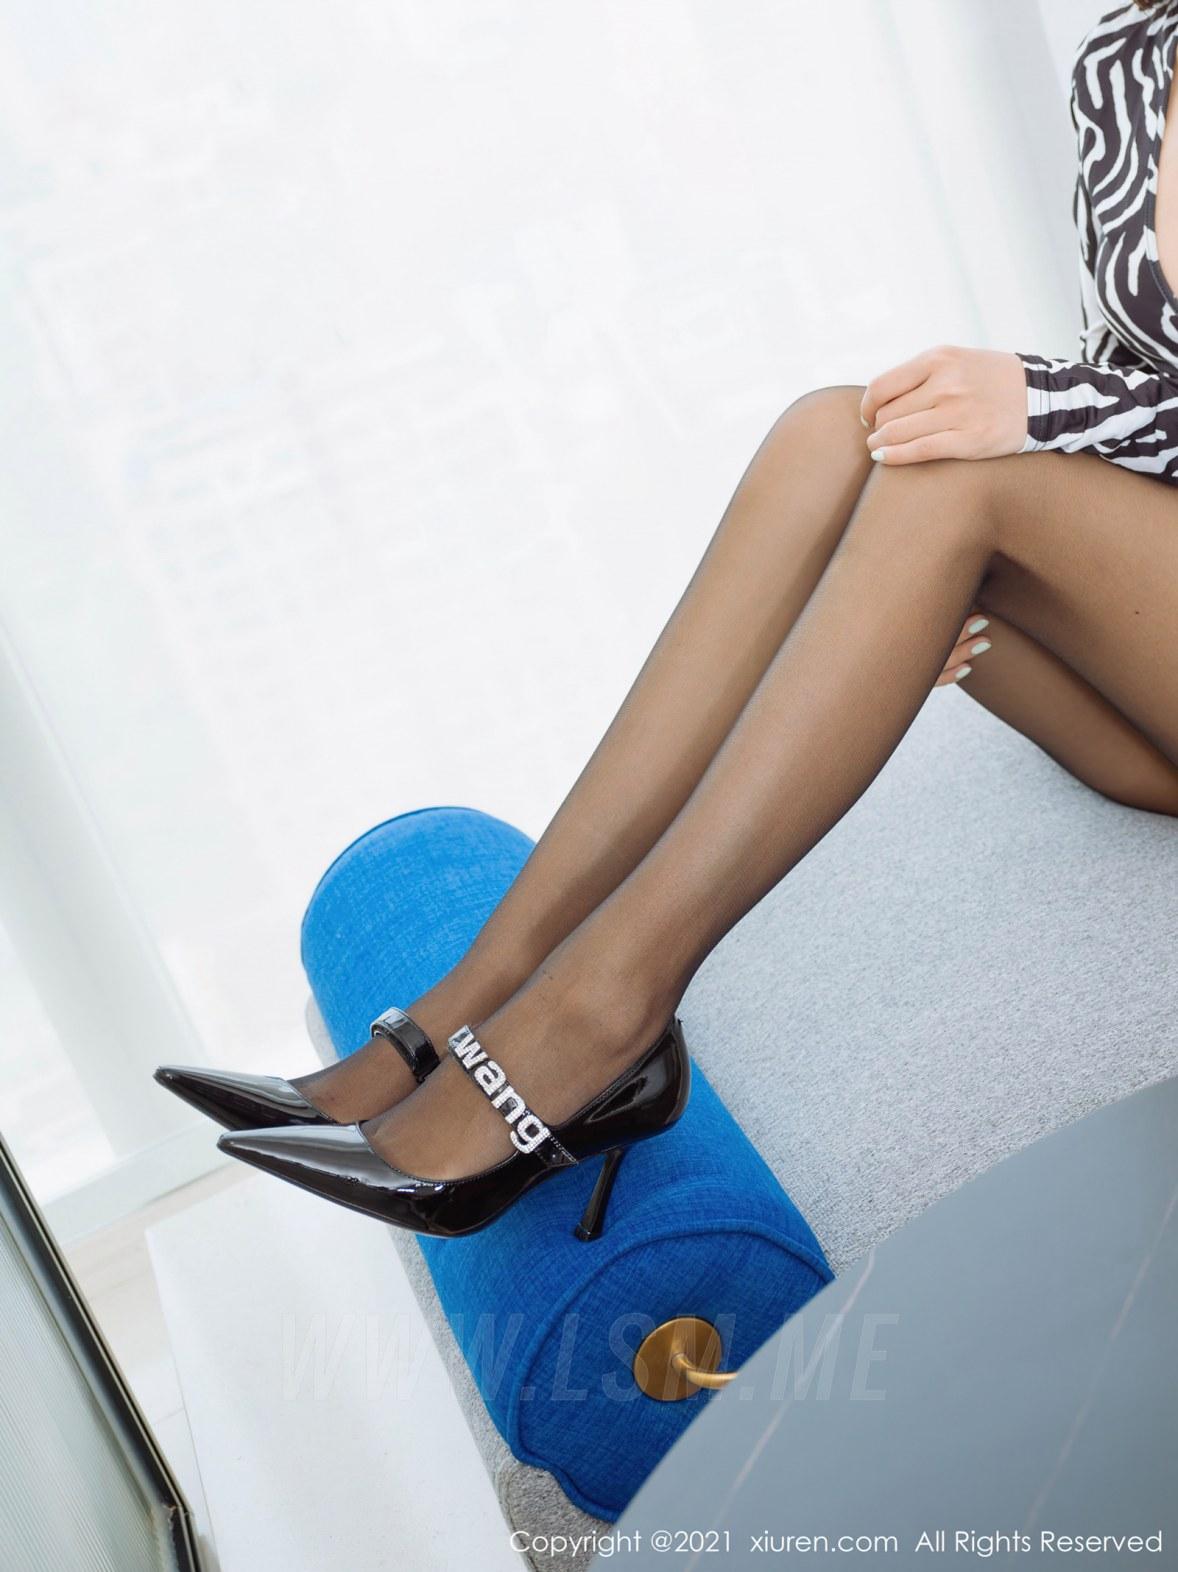 3890 037 dky 4047 5400 - XiuRen 秀人 No.3890 斑纹短裙 可樂Vicky 性感写真2 - 秀人网 -【免费在线写真】【丽人丝语】